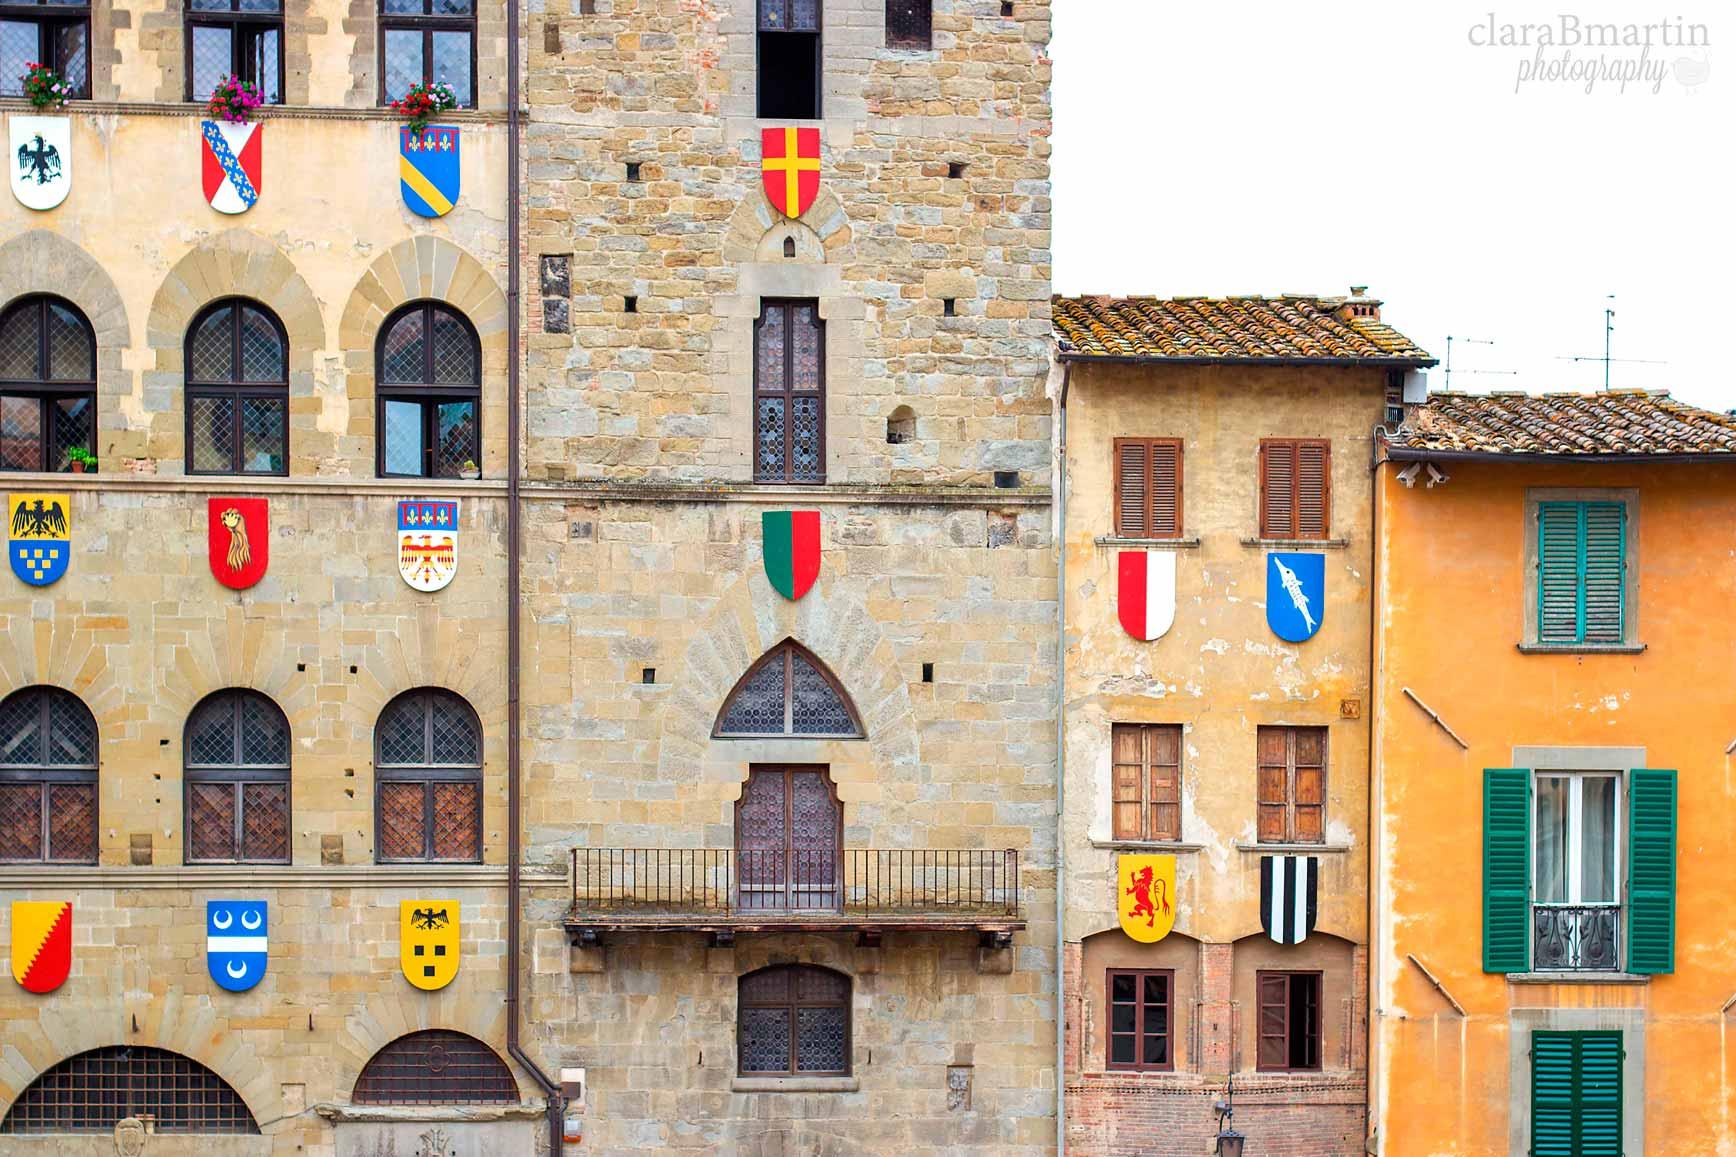 ToscanaclaraBmartin_02